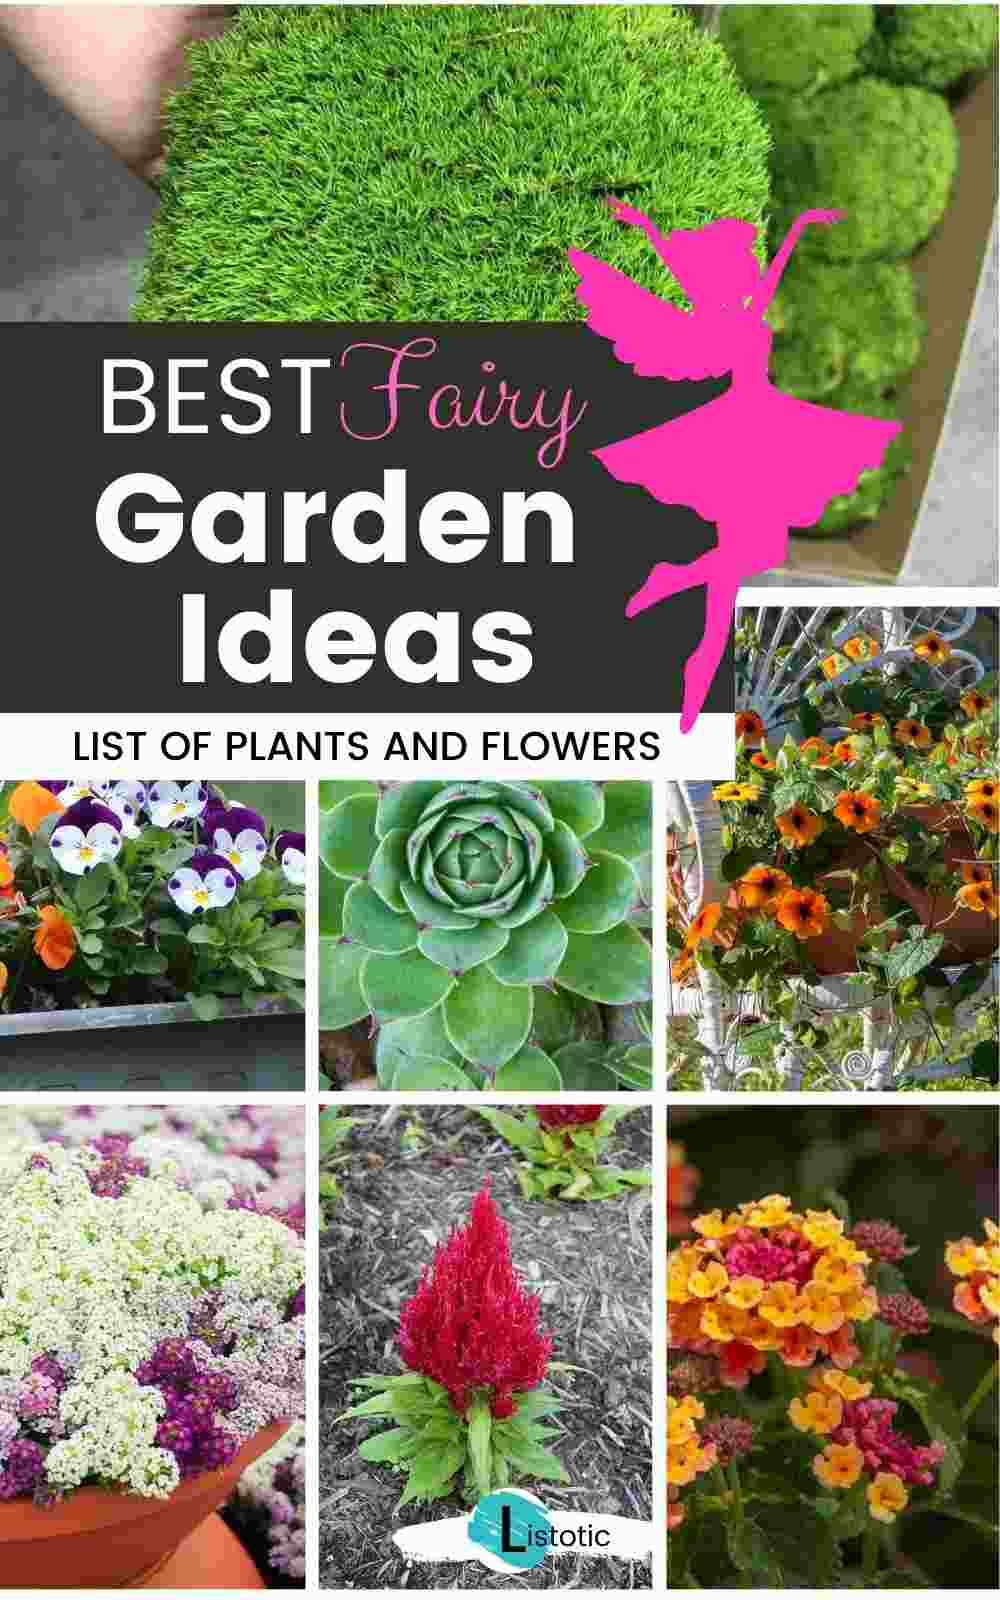 Best Fairy Garden Ideas and hardy annual flowers